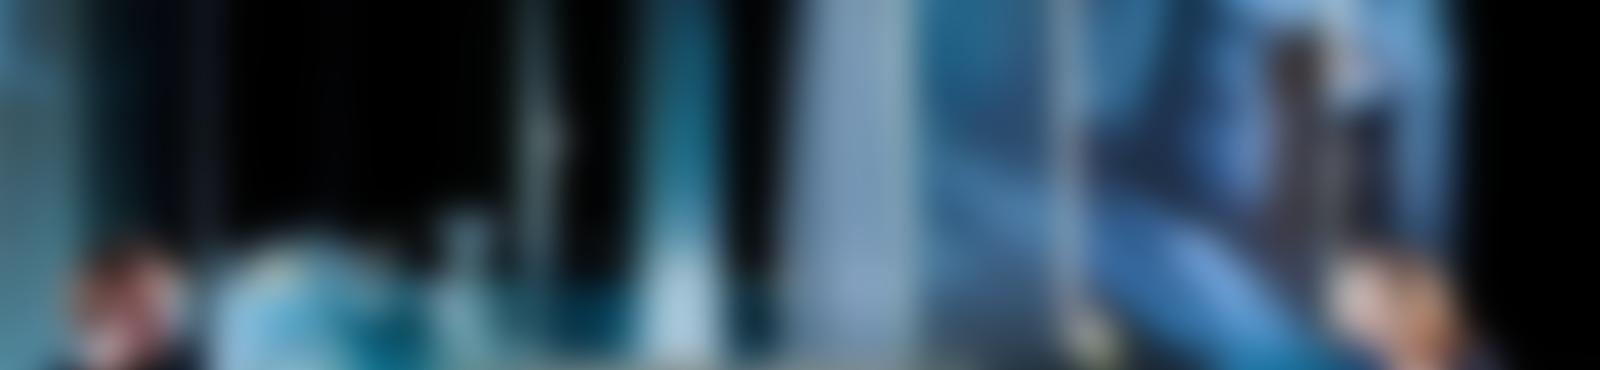 Blurred da monen